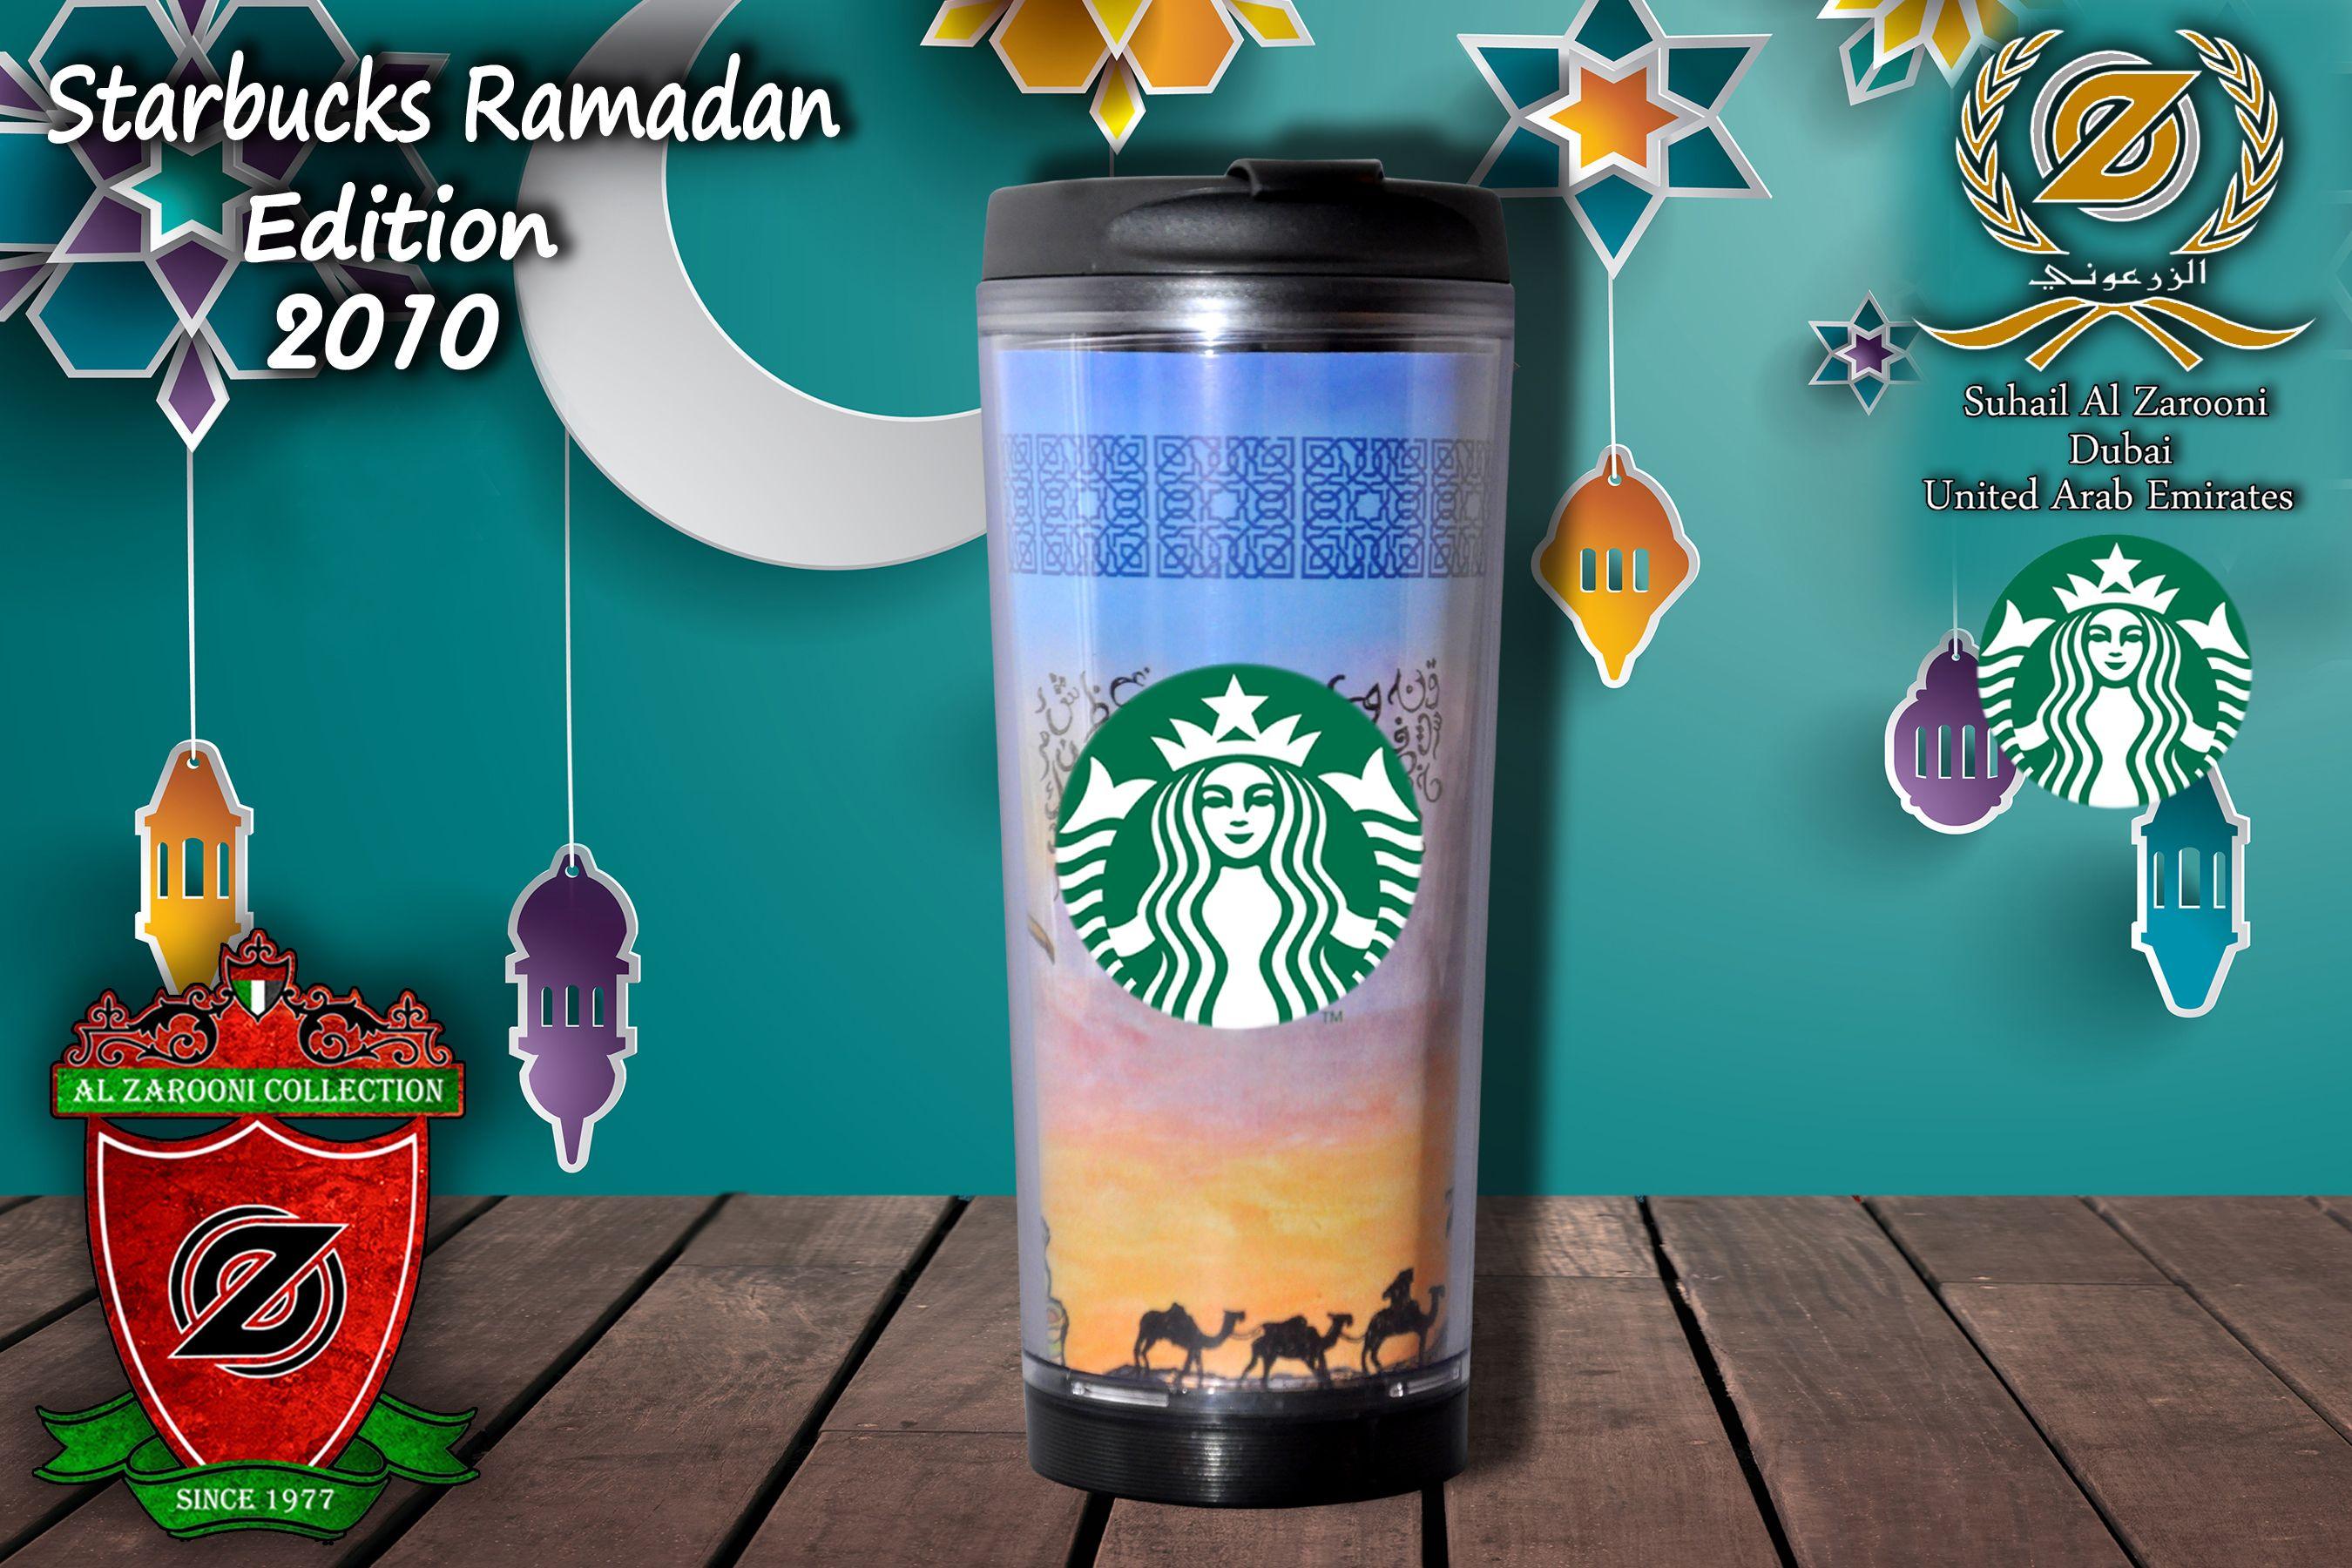 Starbucks Corporation American Coffee Company